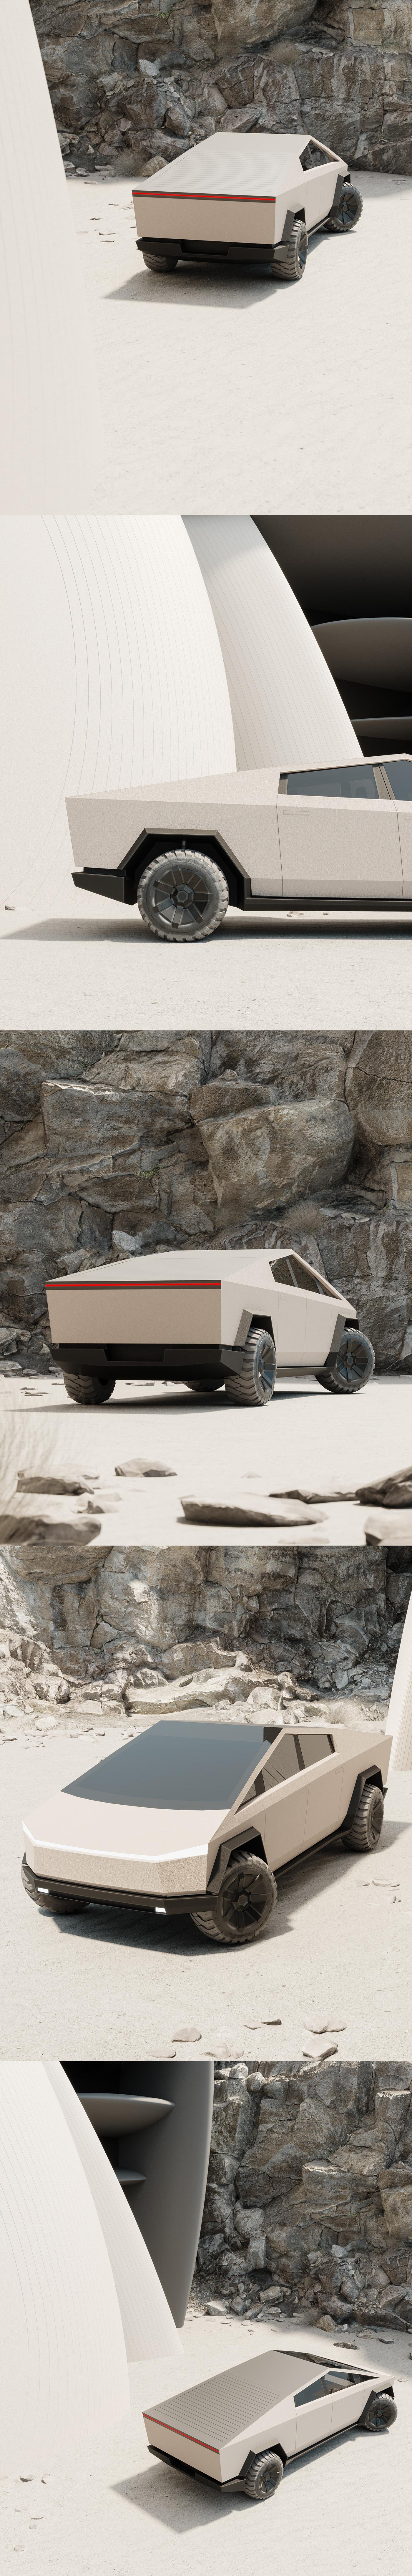 Image may contain: car, rock and land vehicle